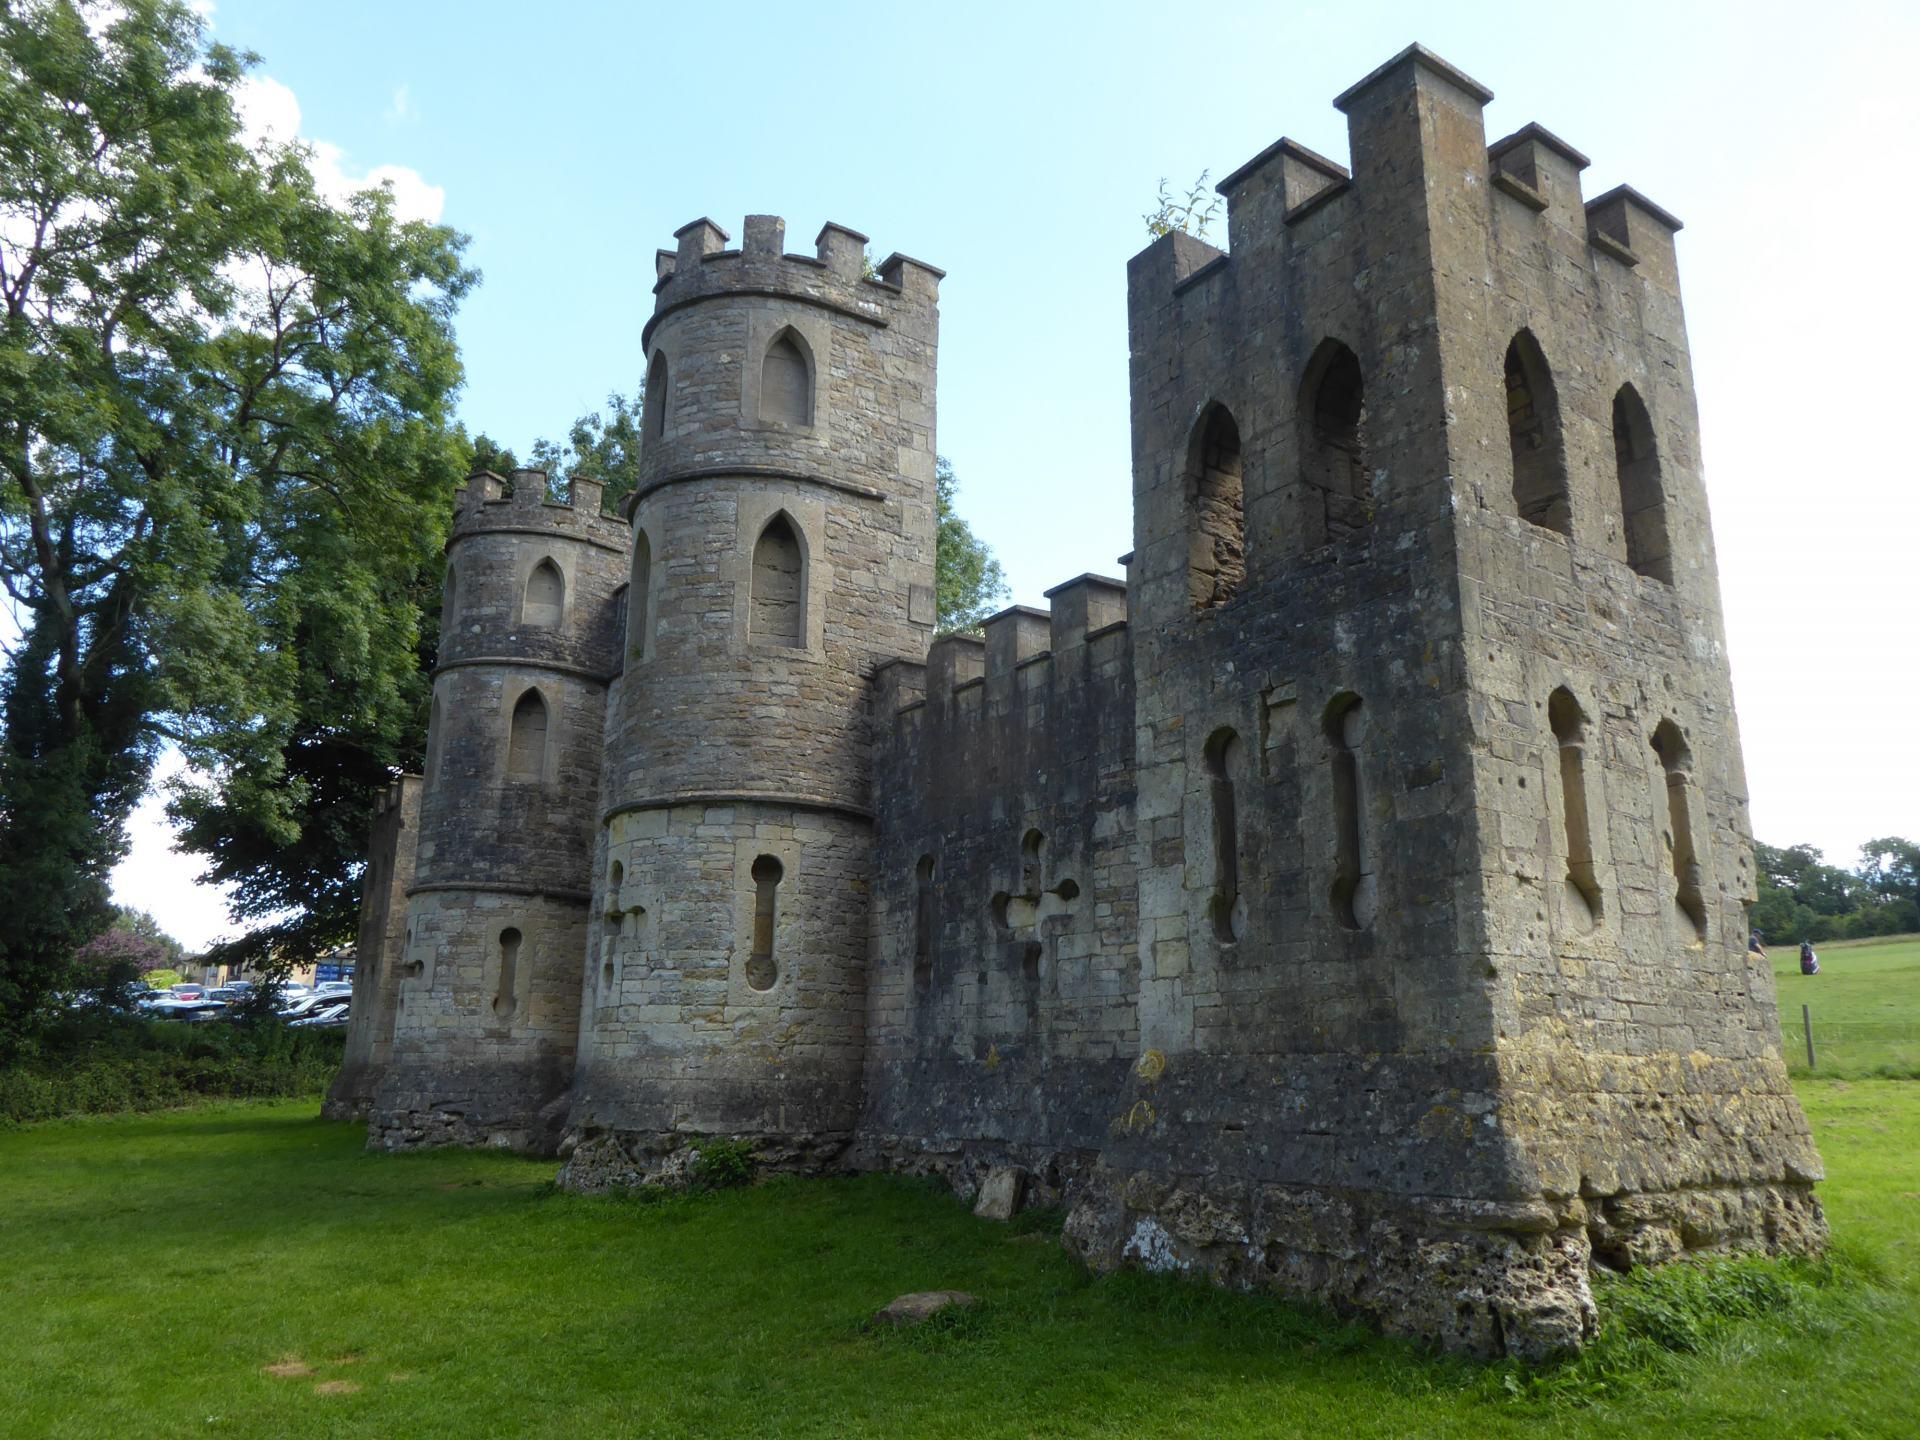 A side on view of Ralph Allen's Sham Castle in Bath.